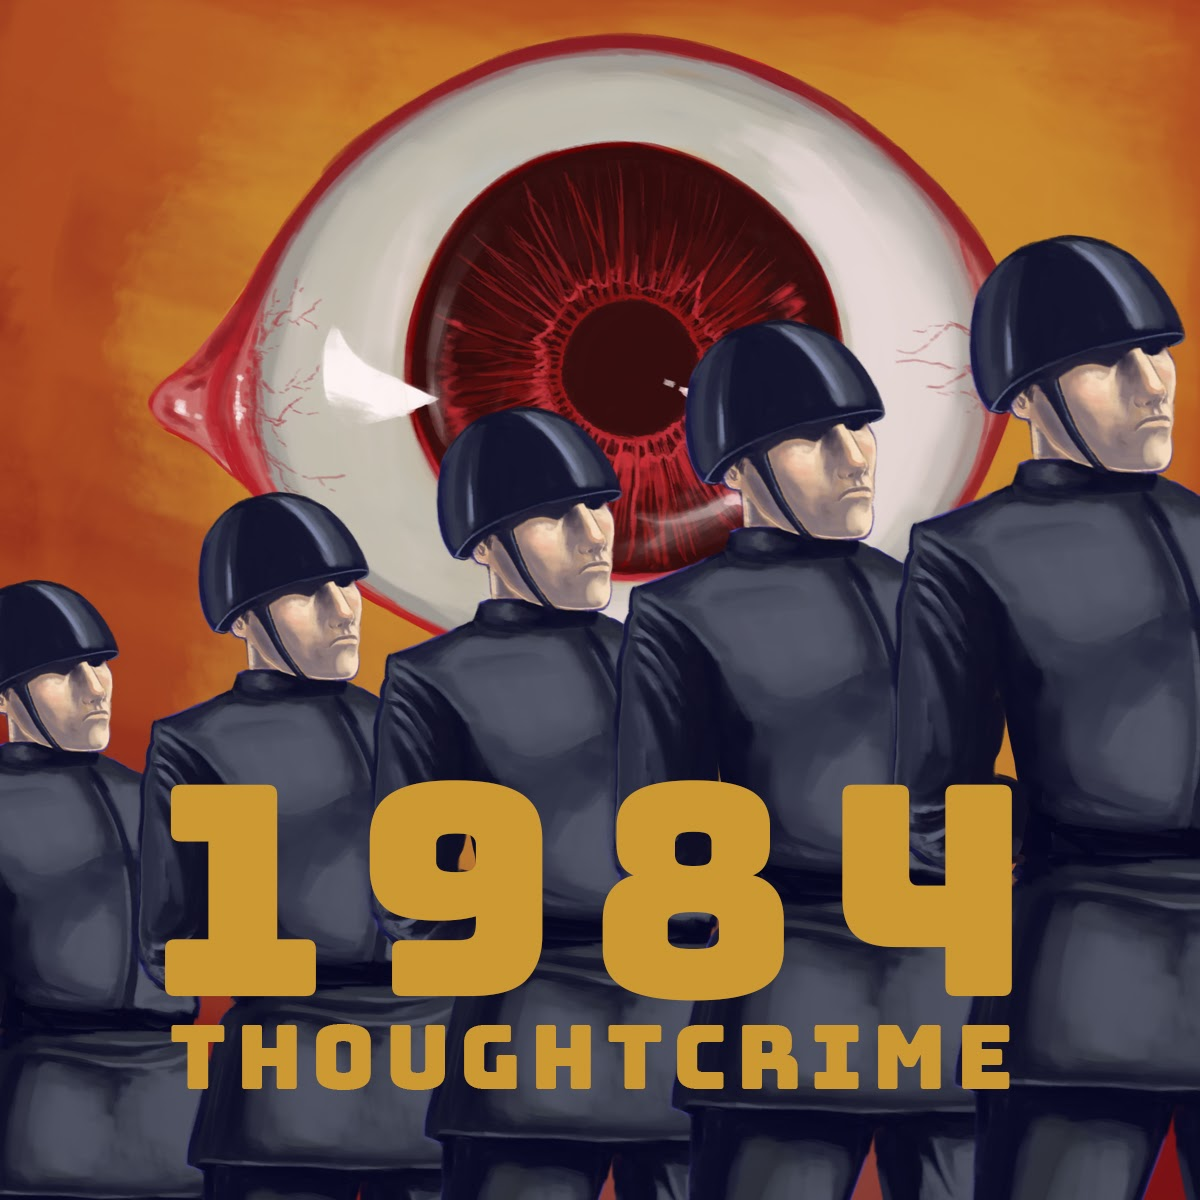 1984 thoughtcrime